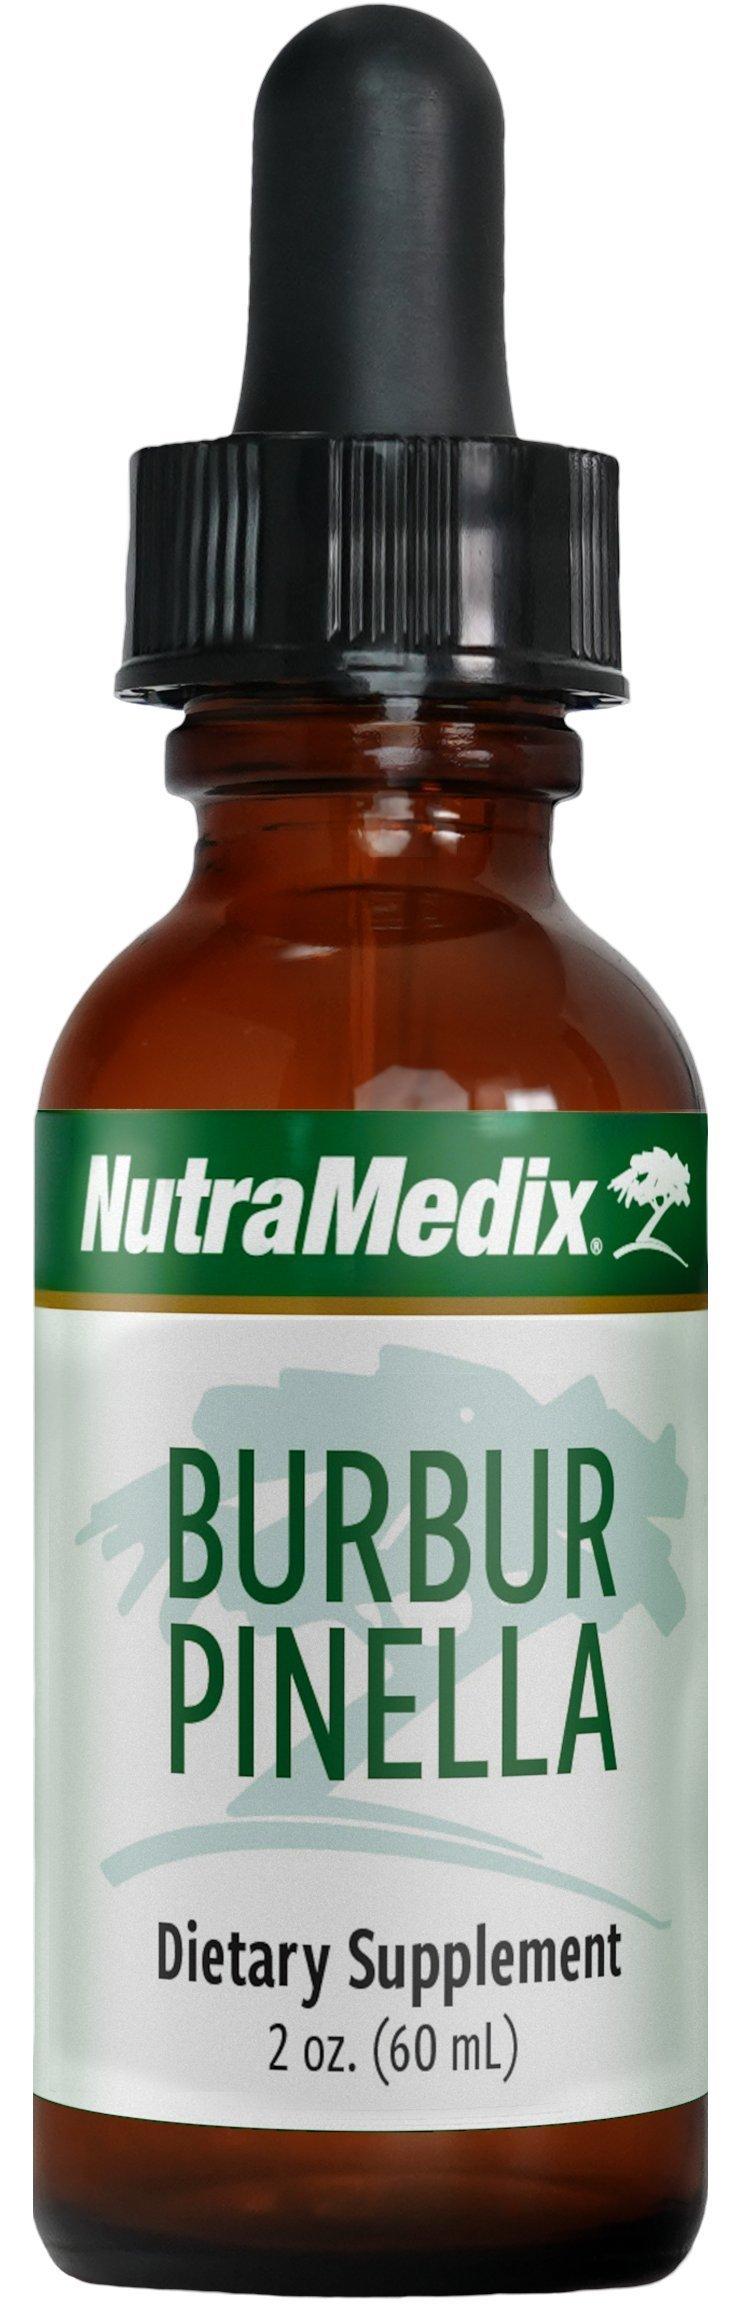 NutraMedix Burbur-Pinella Detox - Peruvian Herbal Blend, Cleansing Support (2 Ounces, 60 Milliliters)